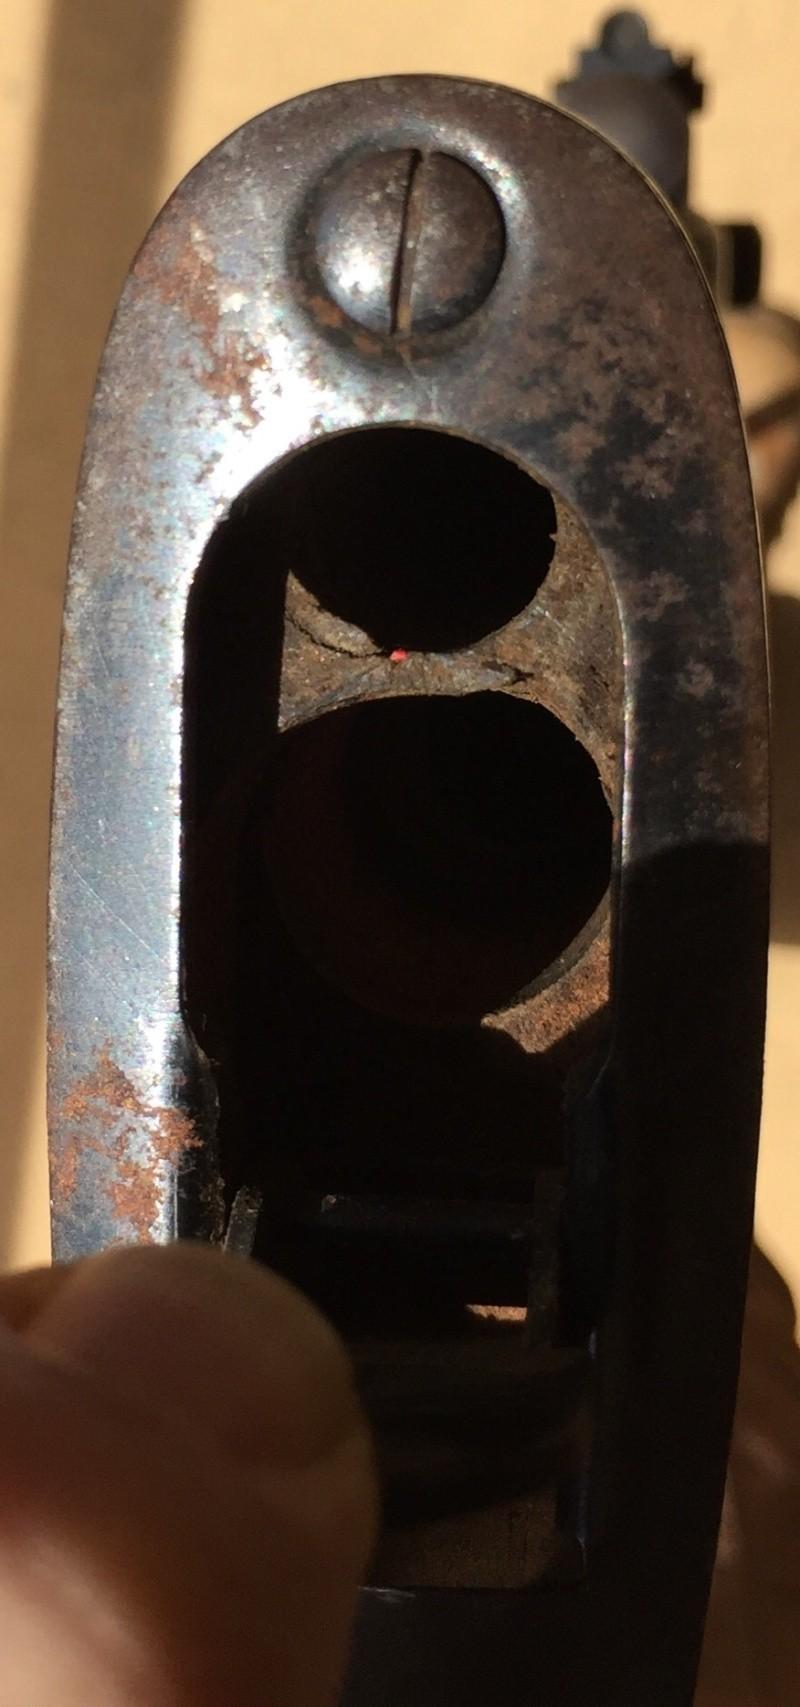 Carabine 22lr MAS 50 [identifiee] Image47